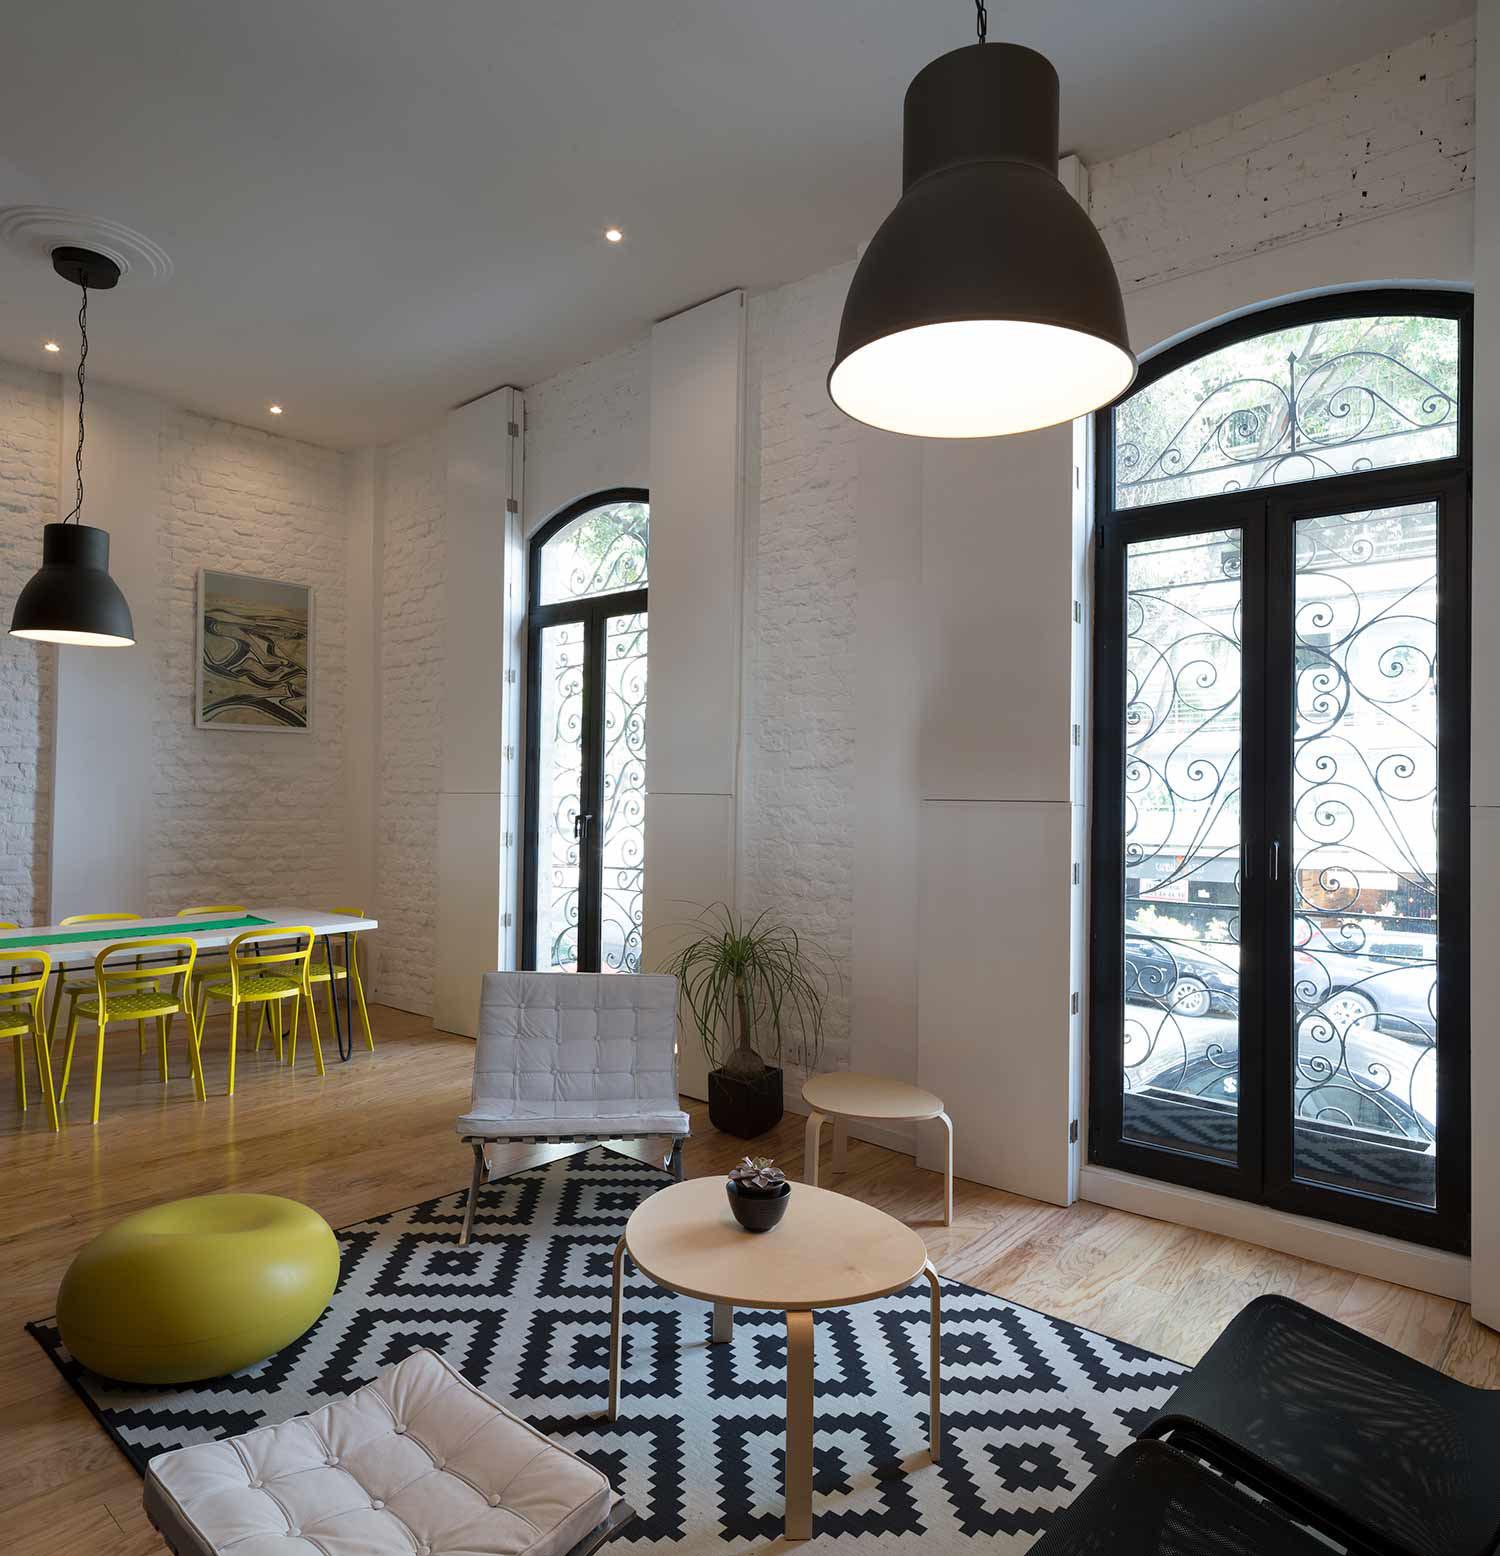 Stylish Loft Apartment In Mexico City iDesignArch Interior